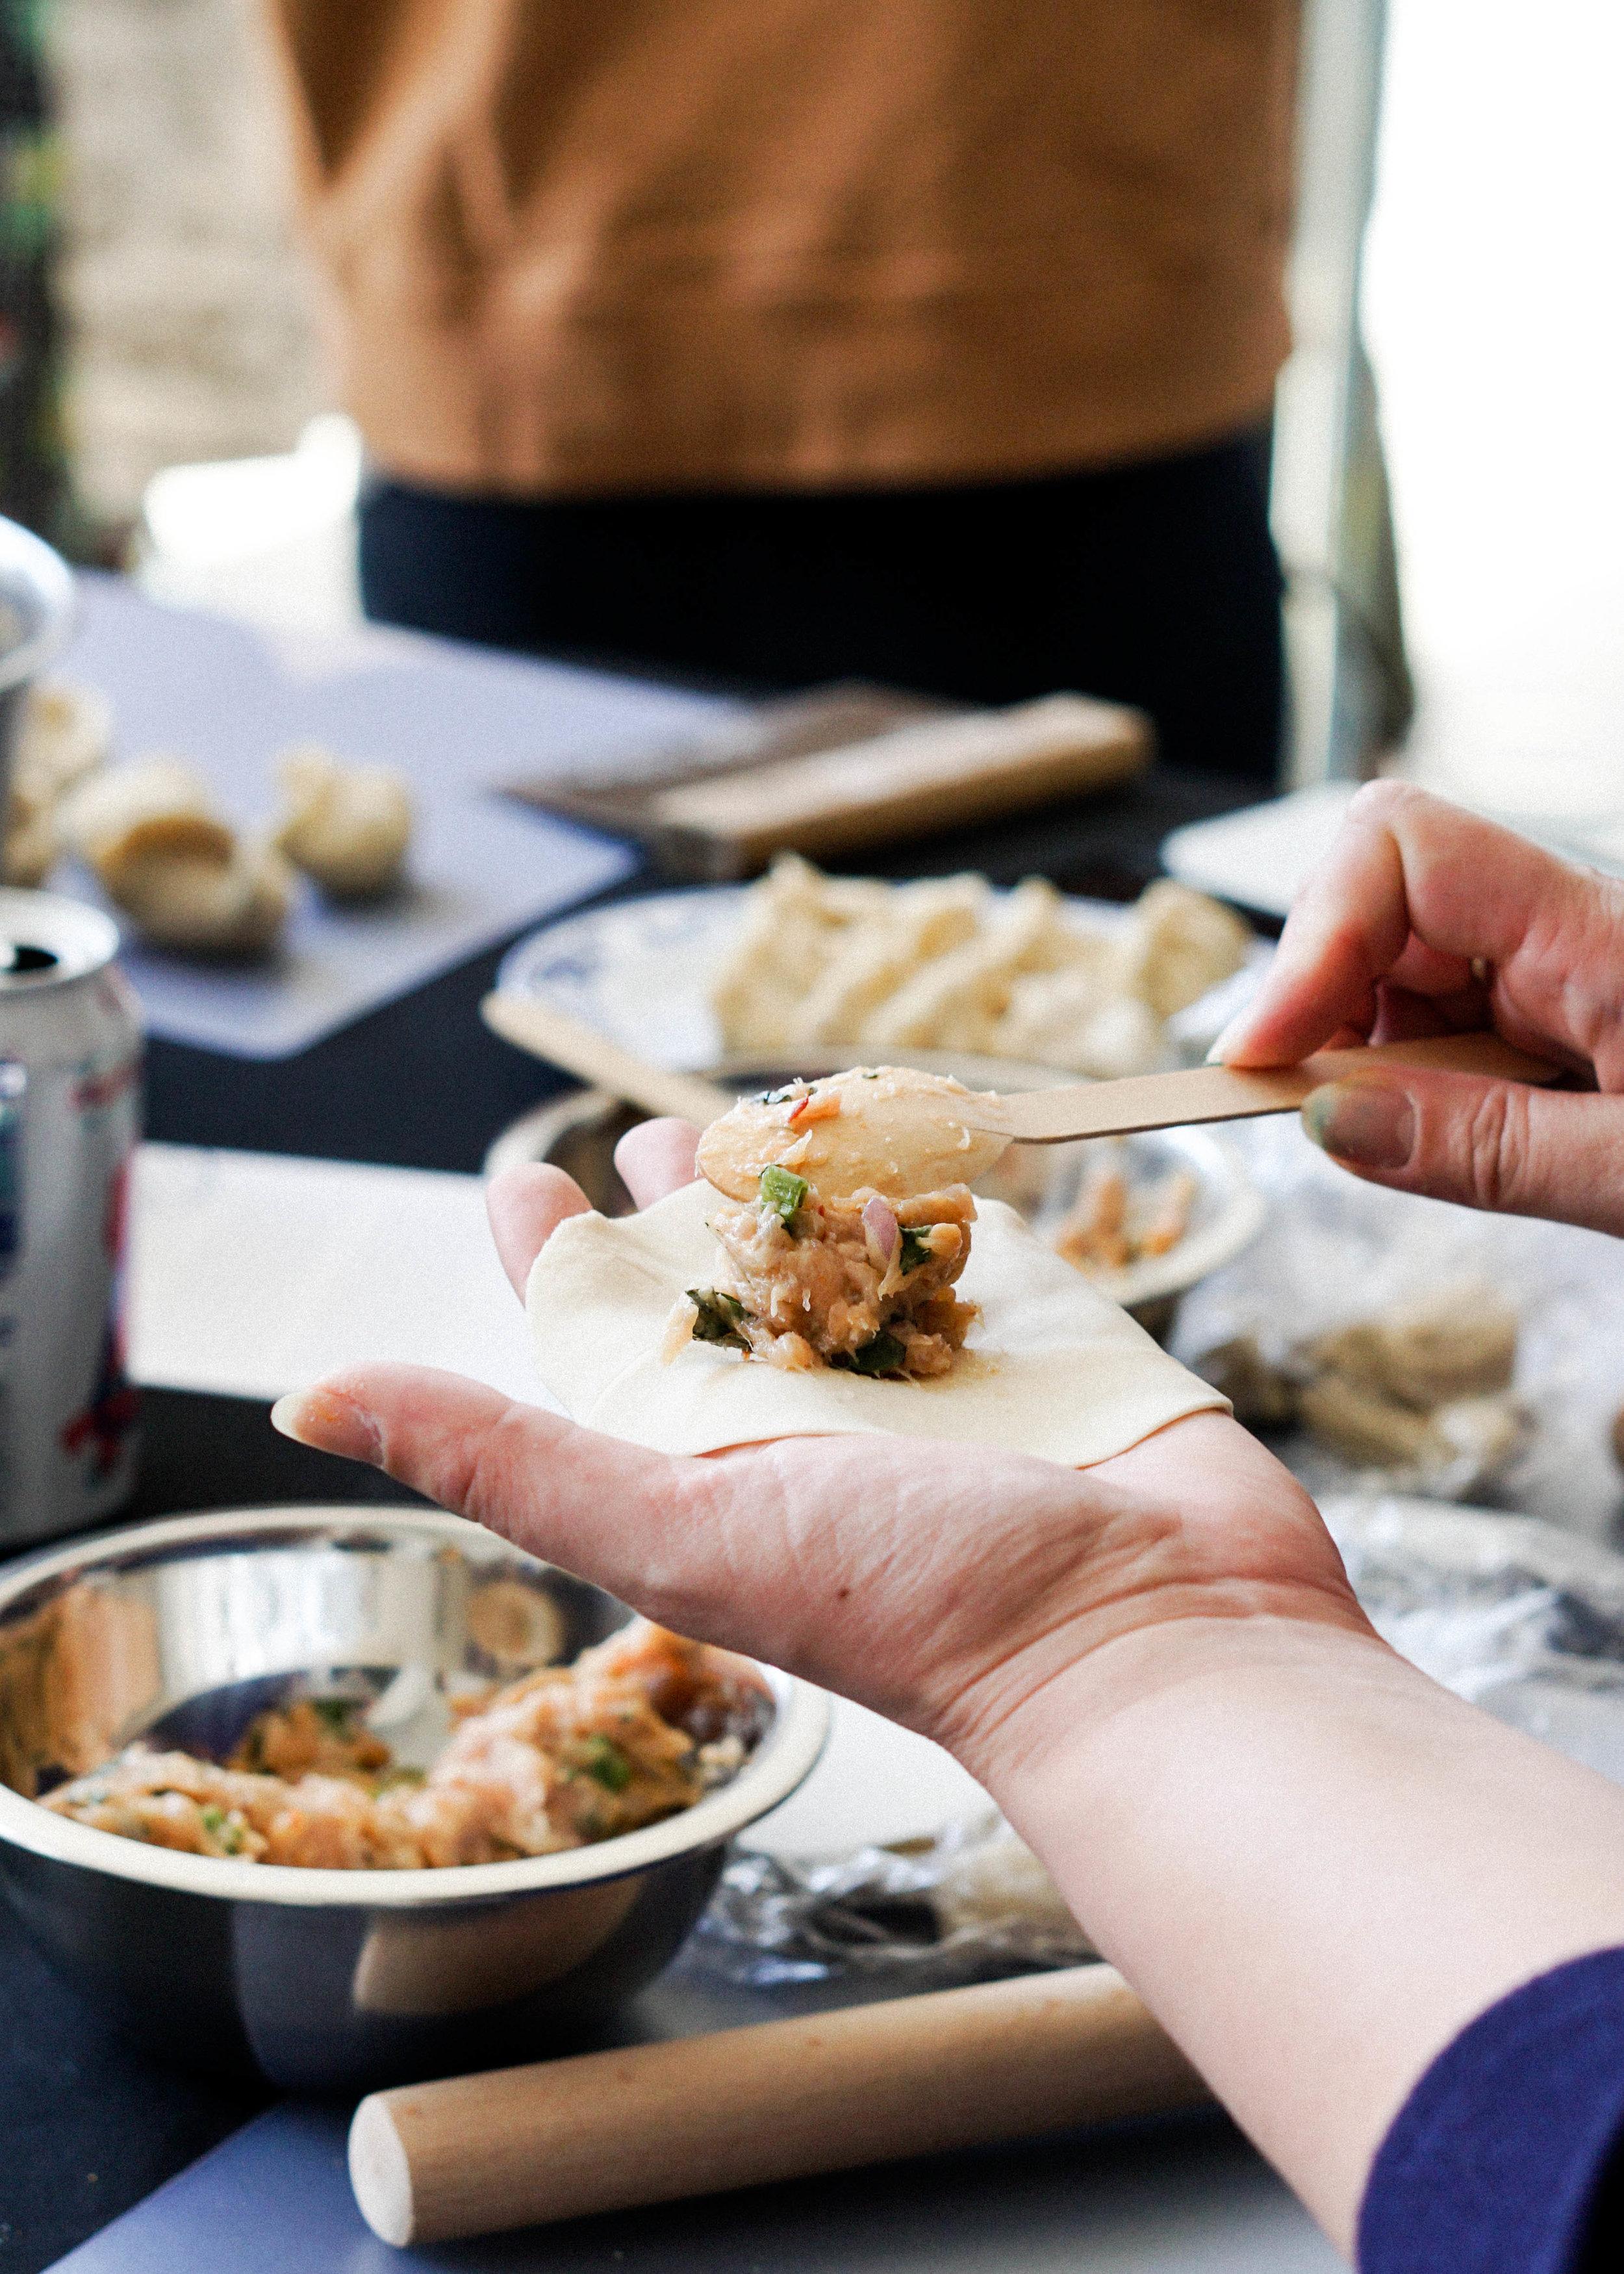 San Francisco Dumpling Workshop - Eat Cho Food